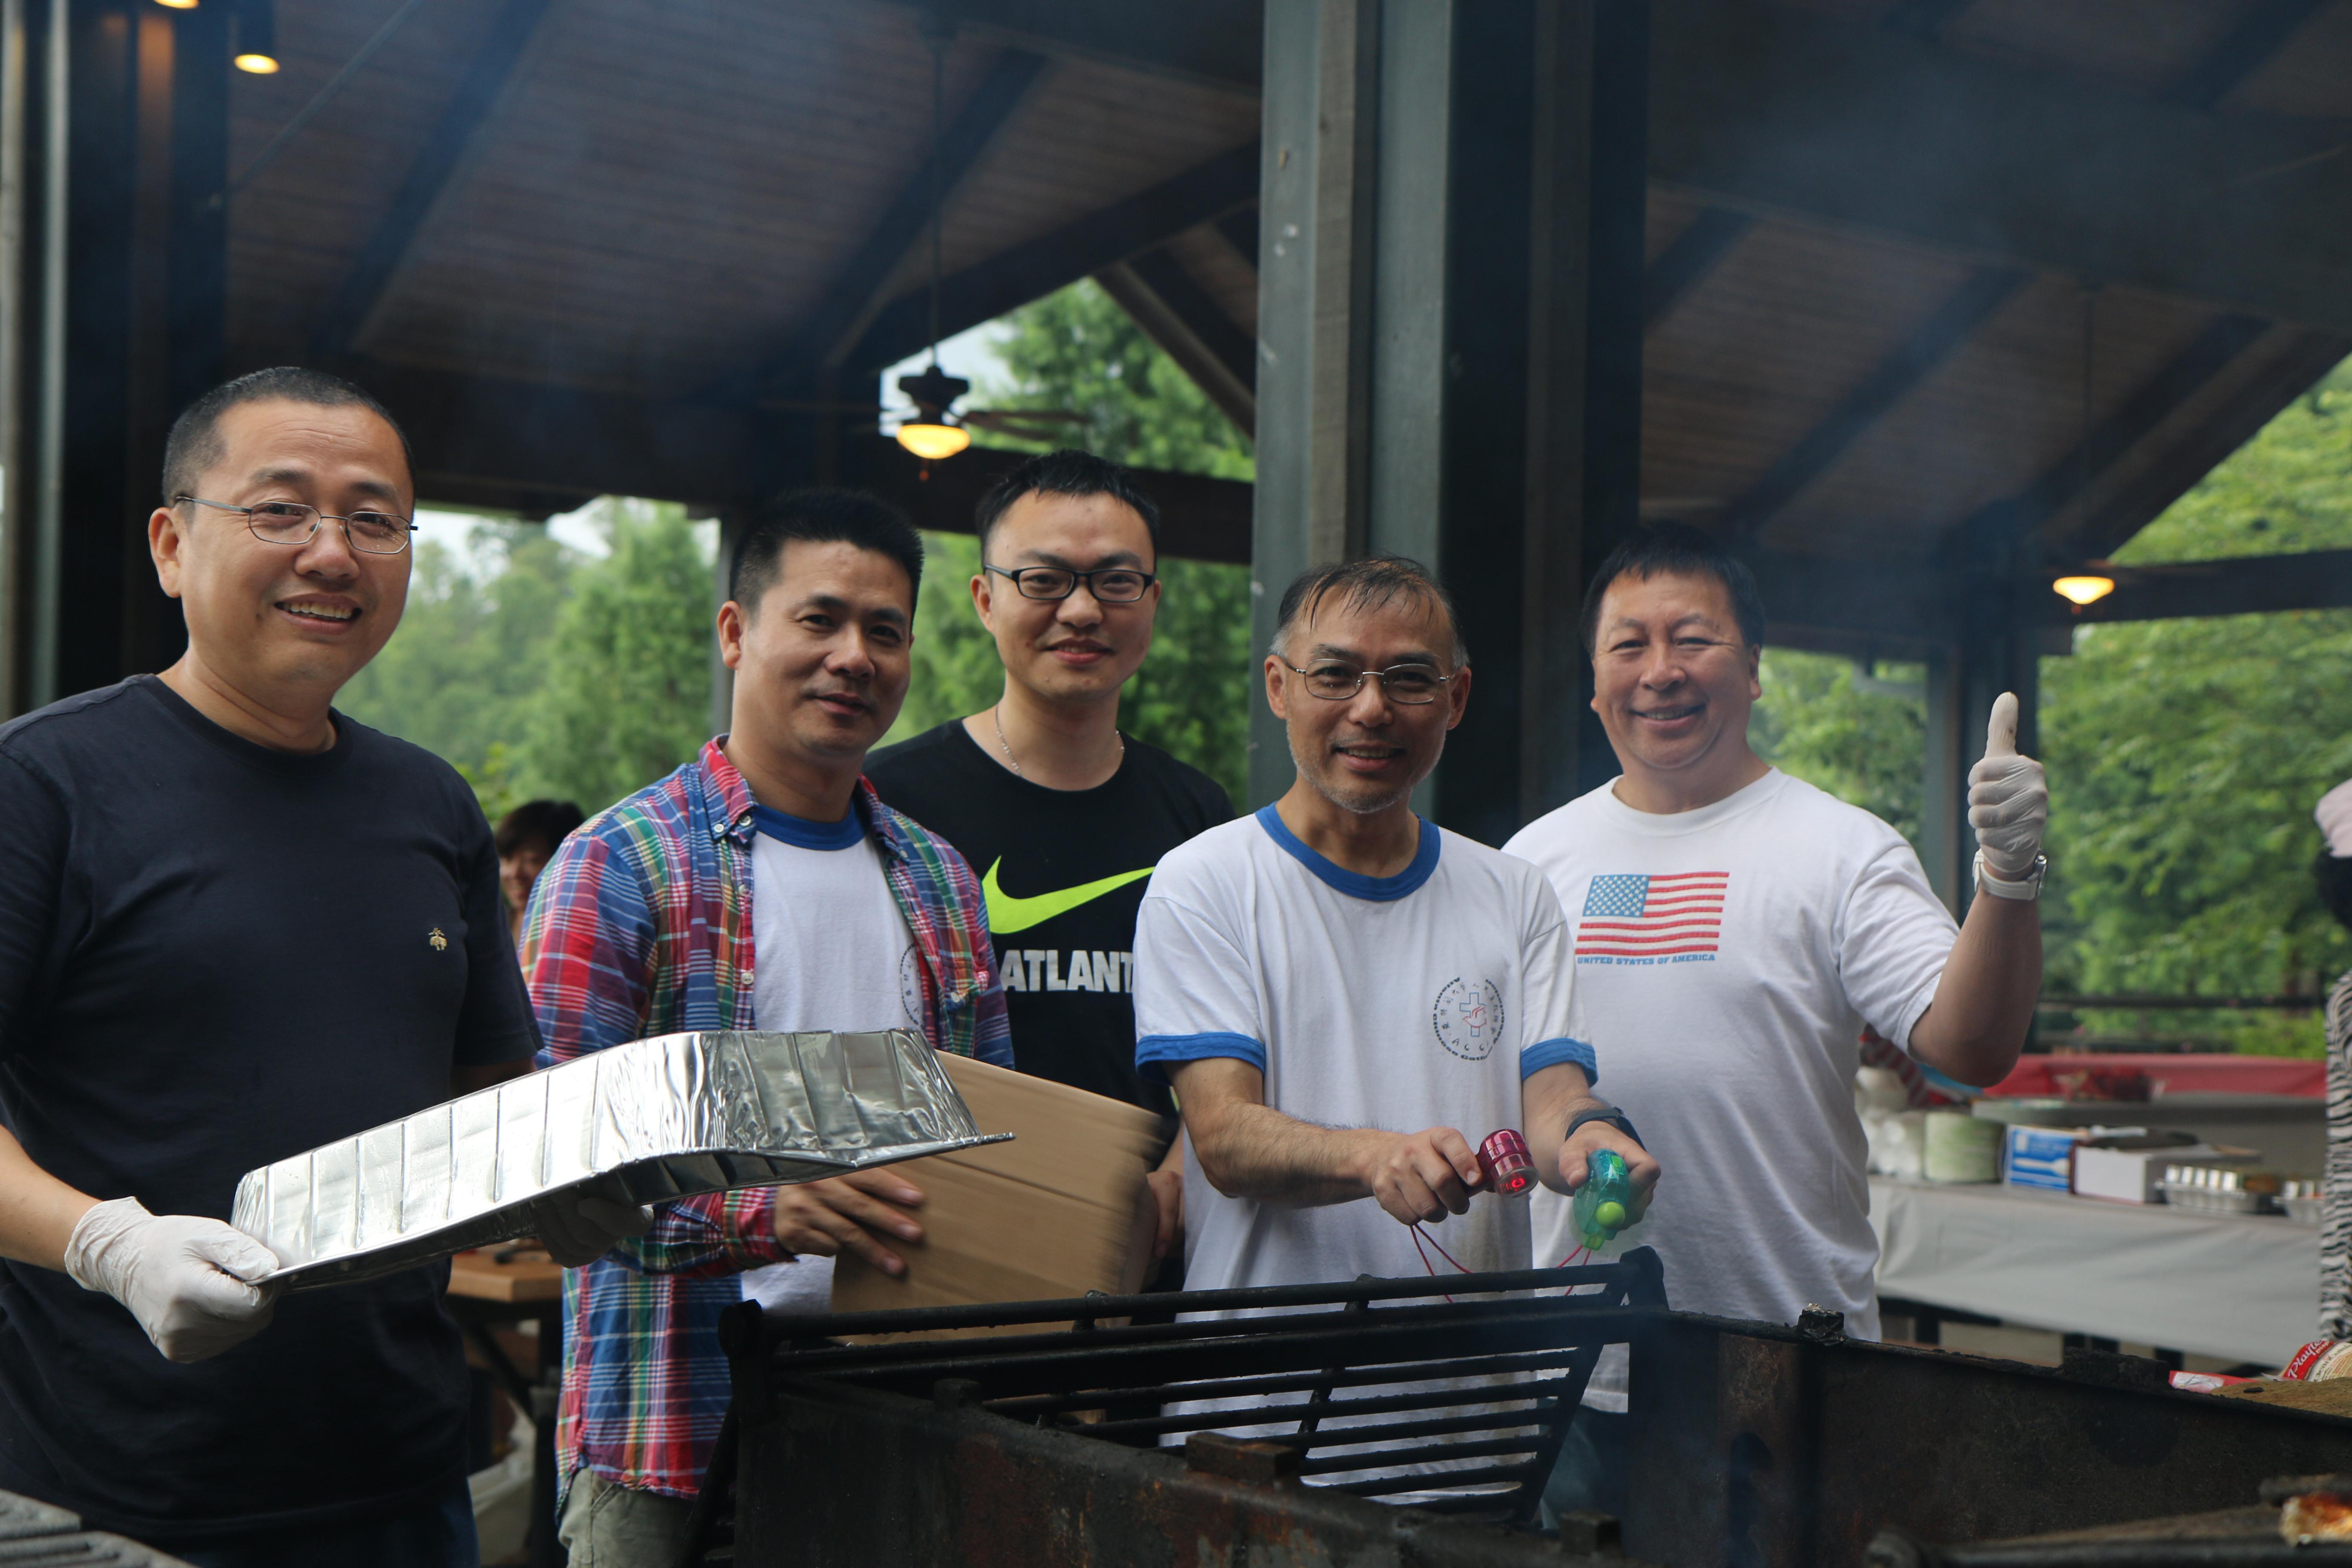 2015 July 4th BBQ